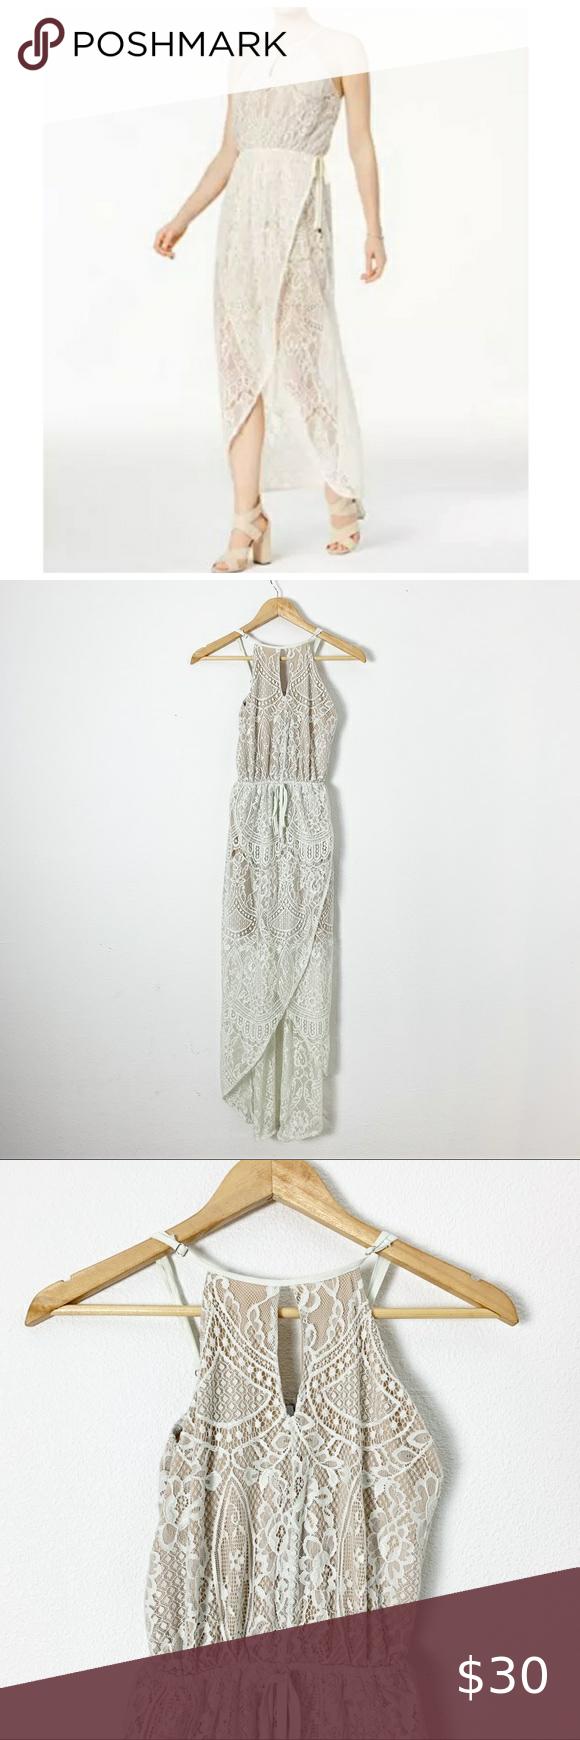 Bar III Lace Wrap Maxi Dress